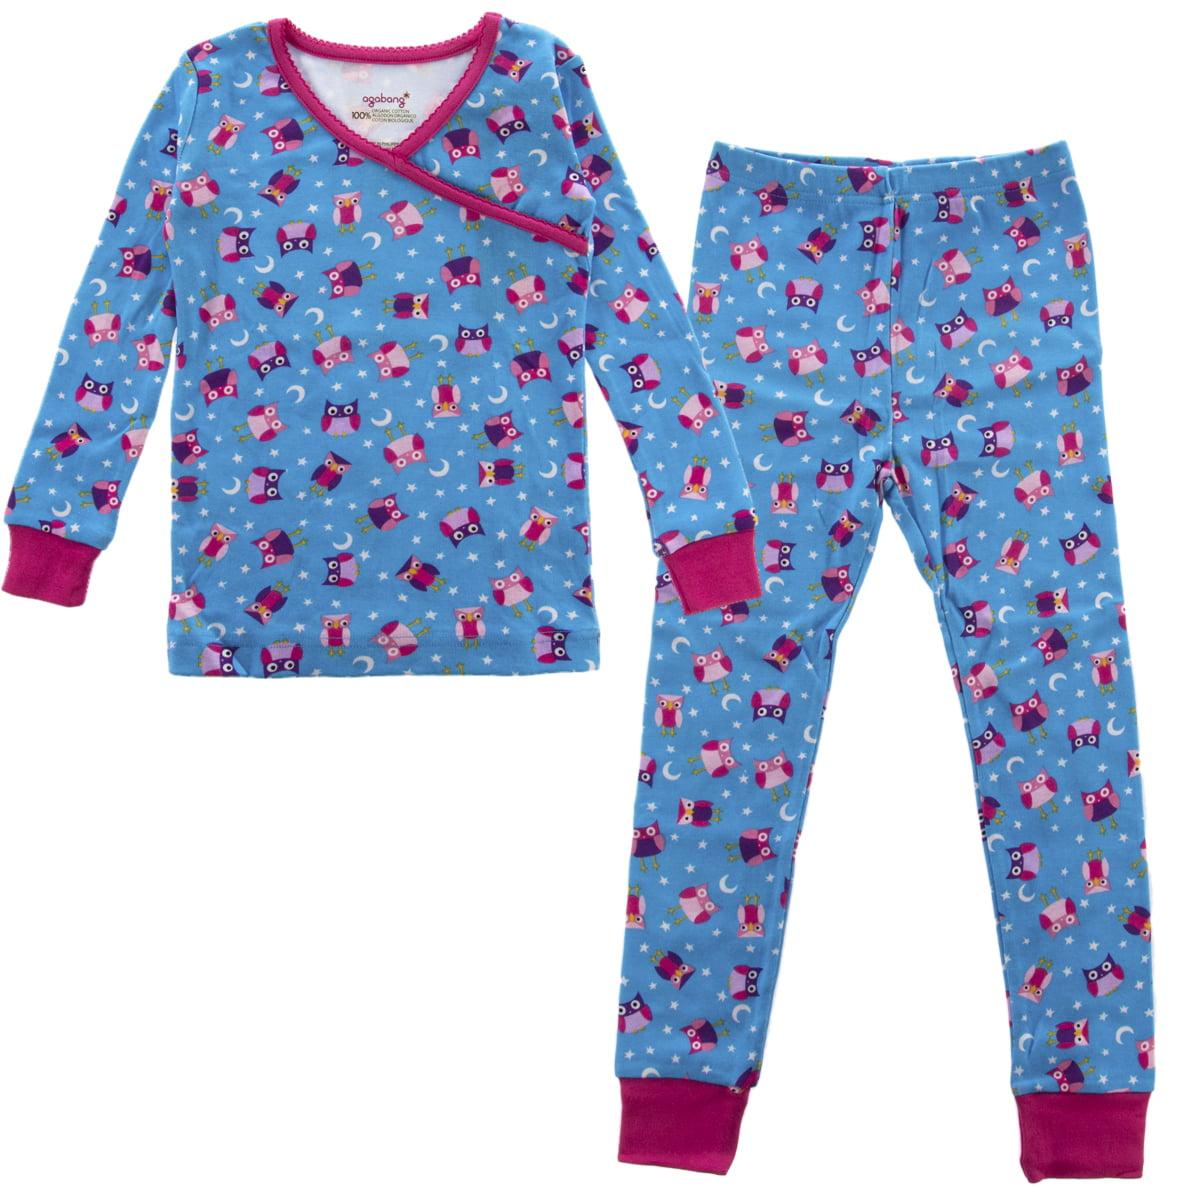 d132af6f9 PLove Kids Two-Piece Organic Cotton Pajamas Little Girls Toddler ...